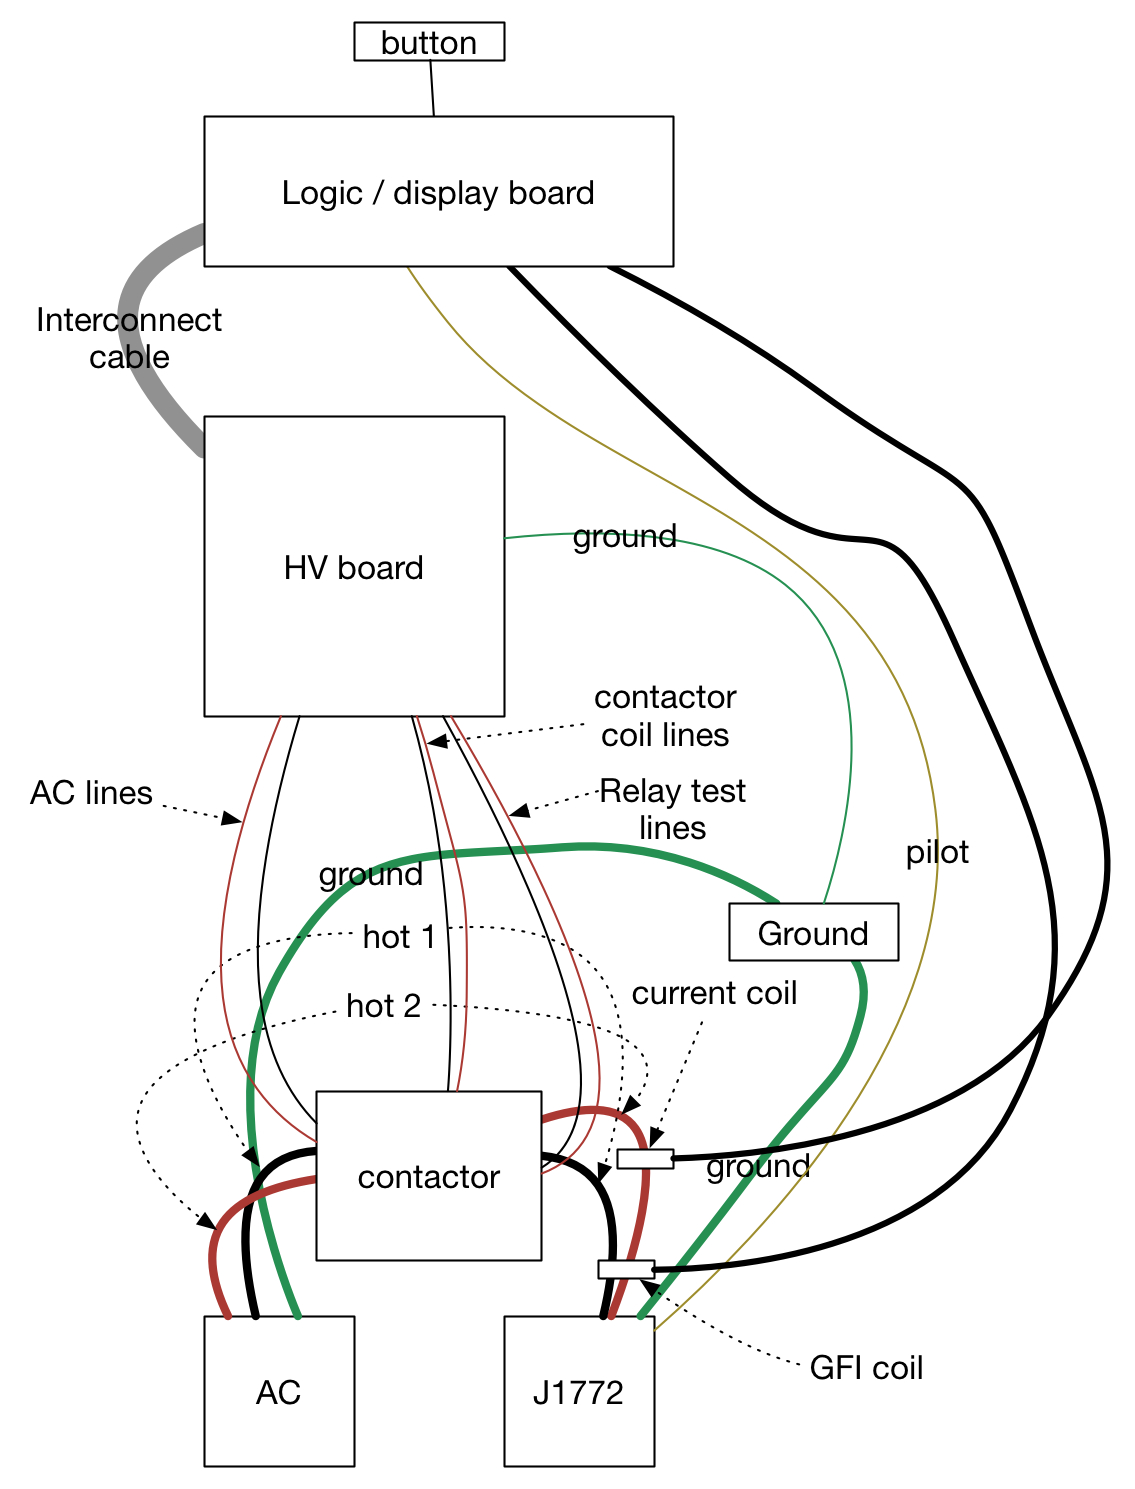 Ac Contactor Wiring Diagram 240 | Wiring Diagram - 240 Volt Contactor Wiring Diagram